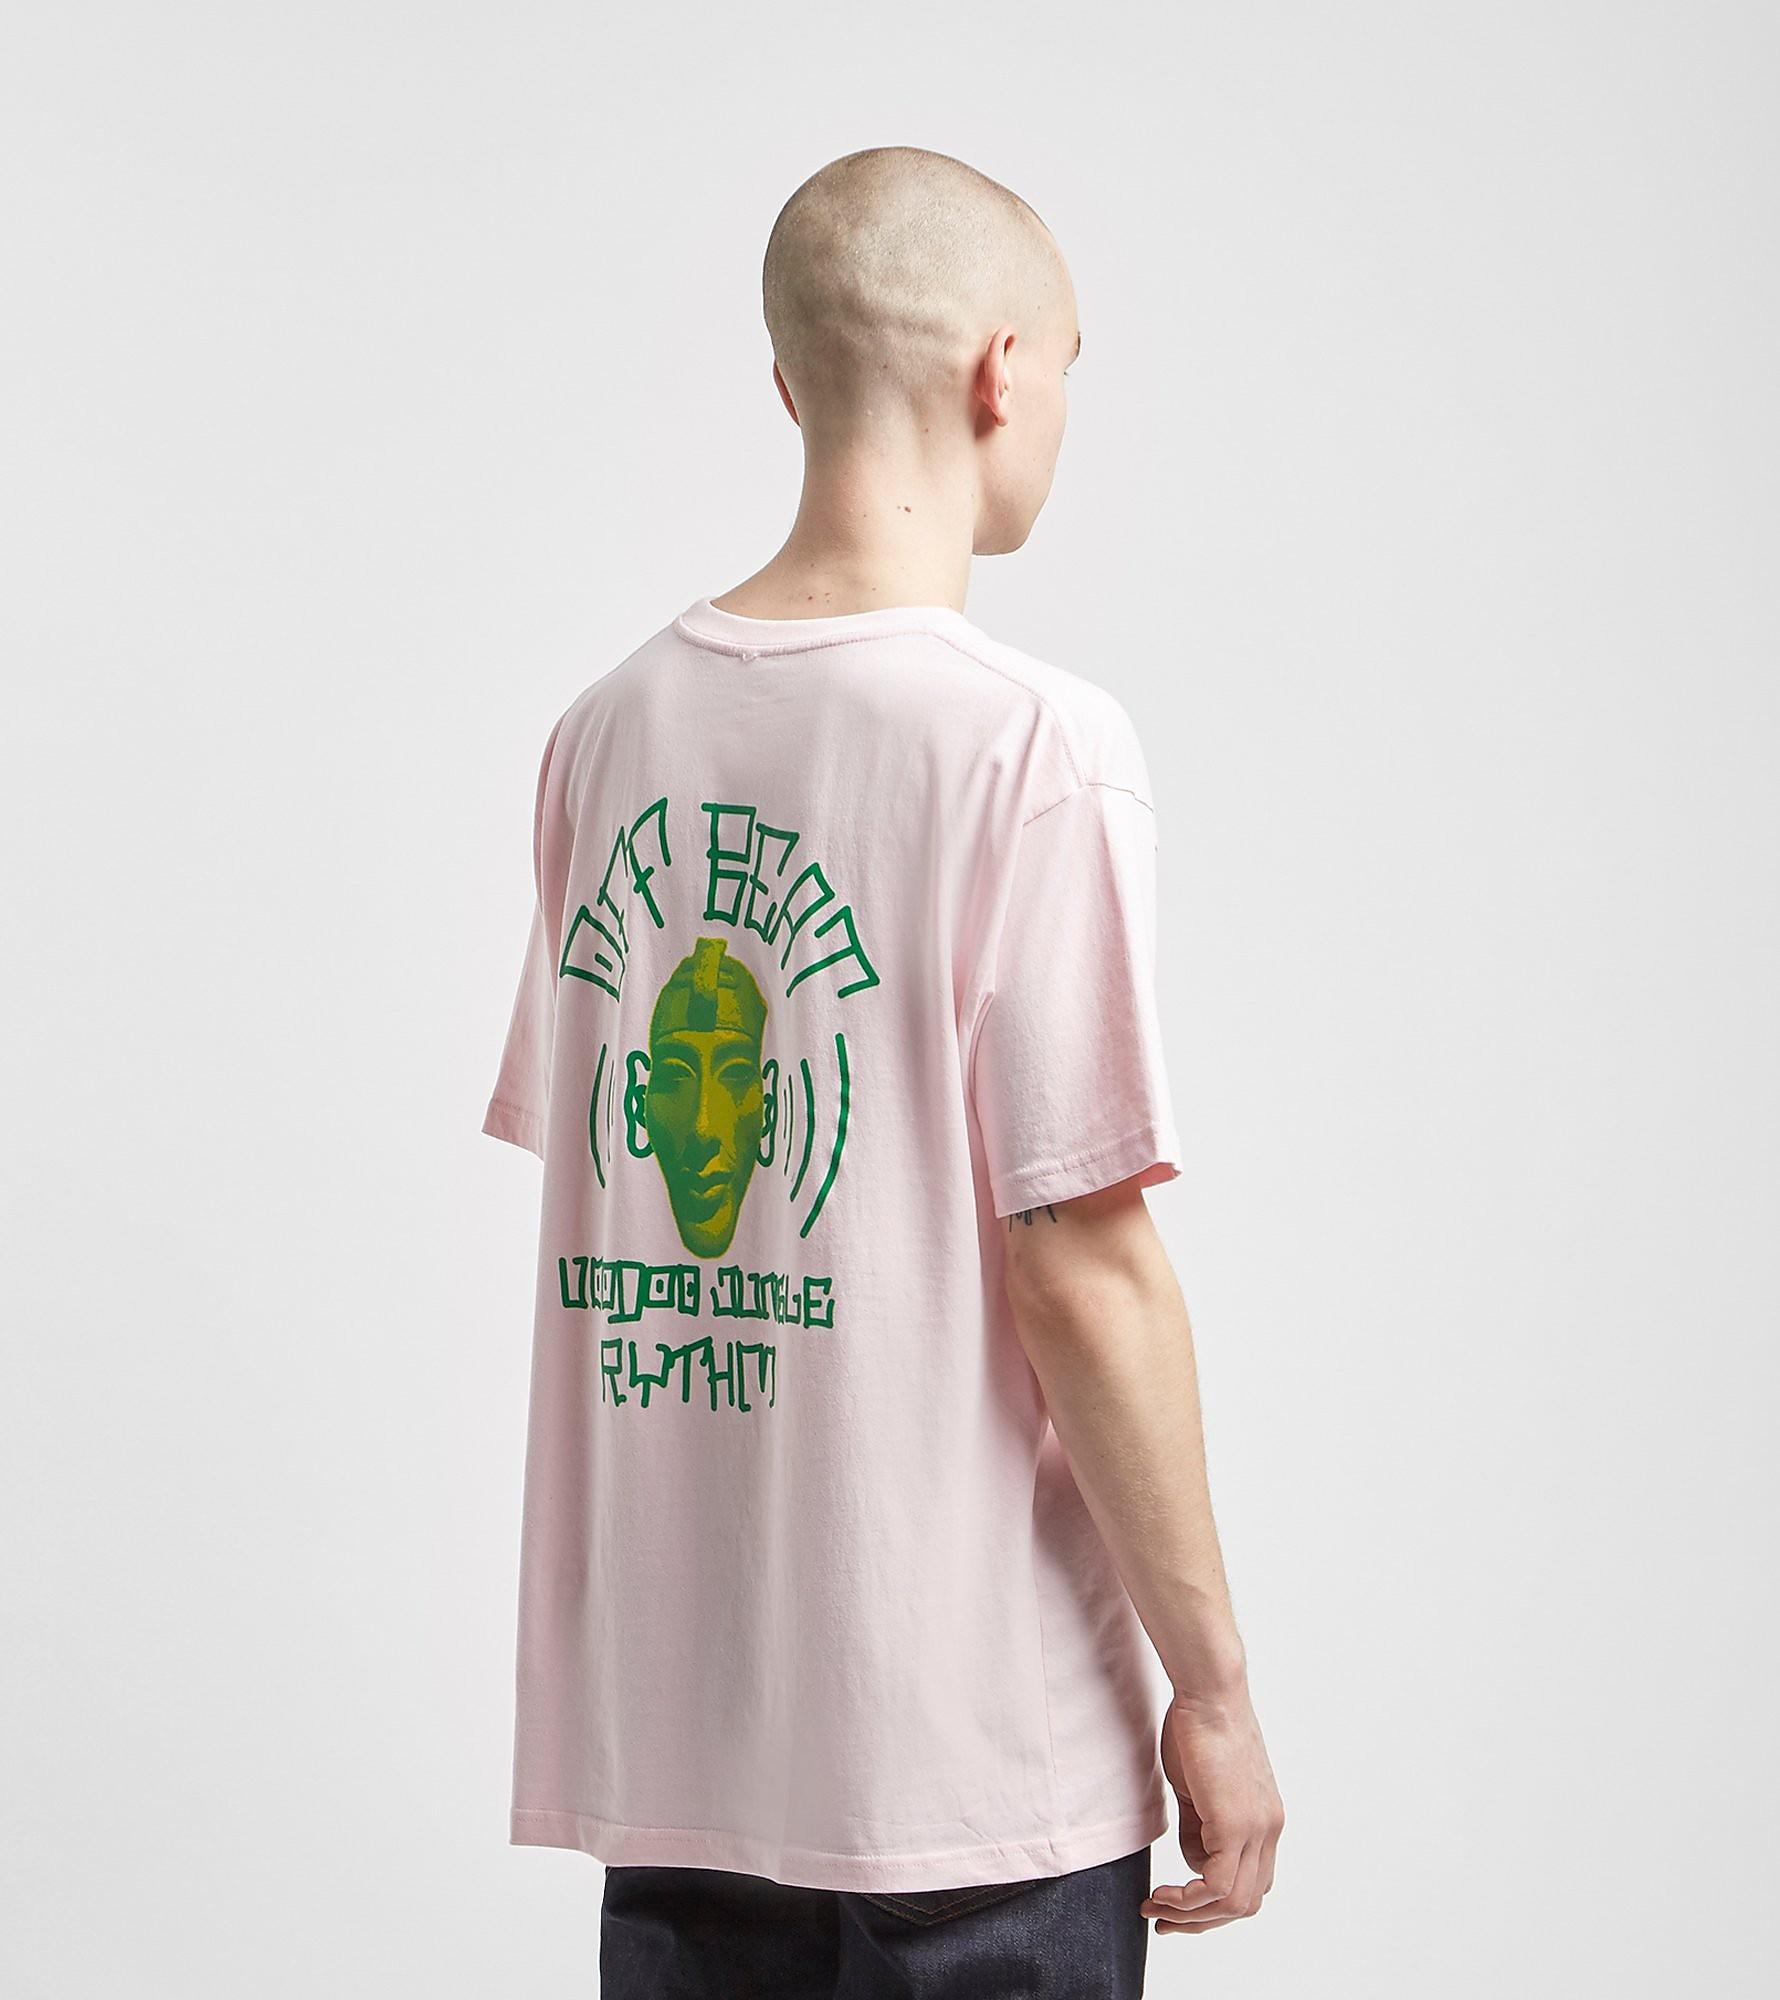 Jungles Jungles T-Shirt Off Beat Rhythm, Rose